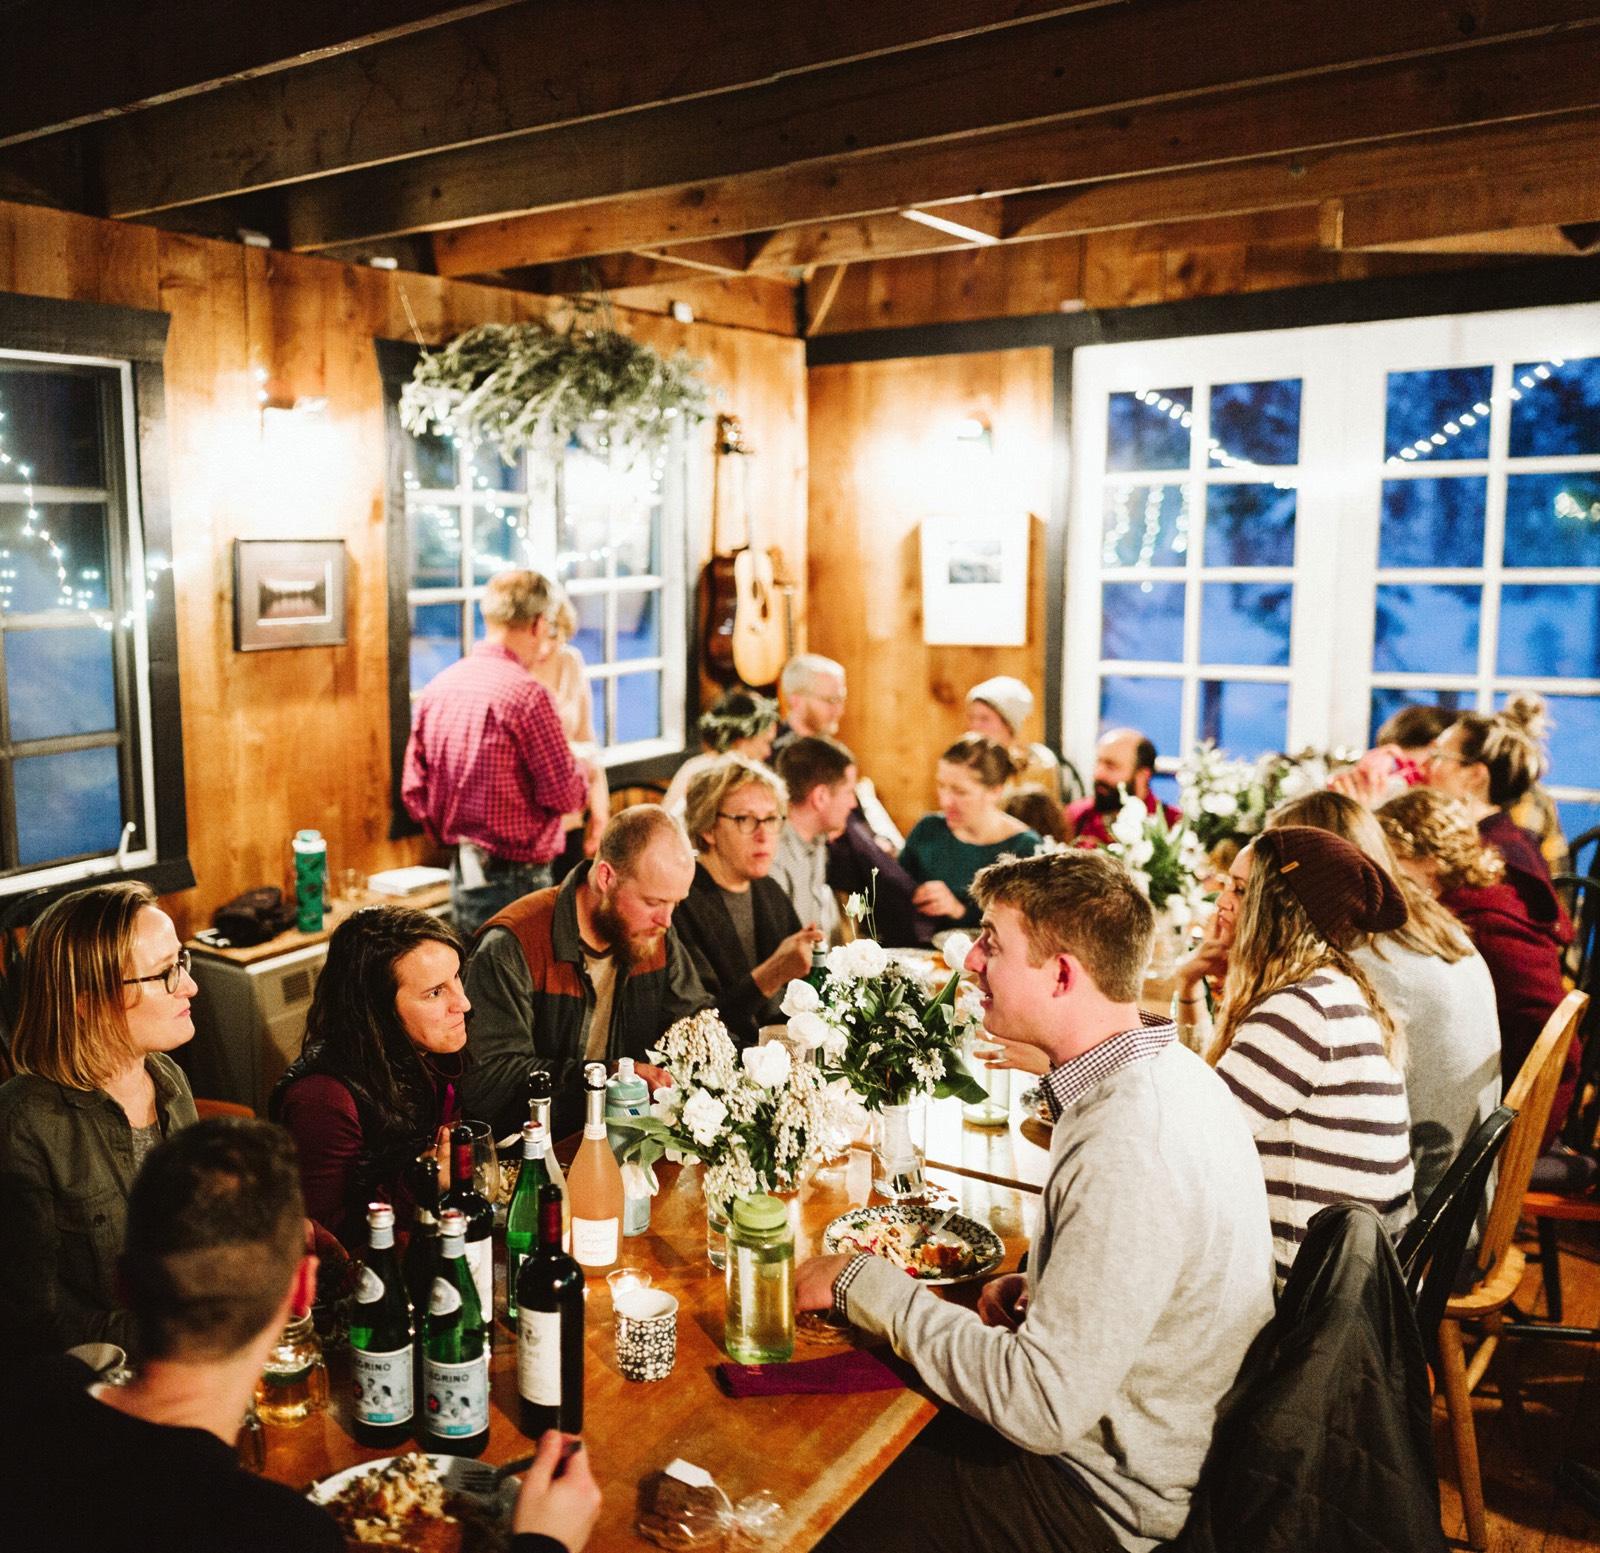 alpine-lakes-high-camp-winter-wedding-86 ALPINE LAKES HIGH CAMP WEDDING